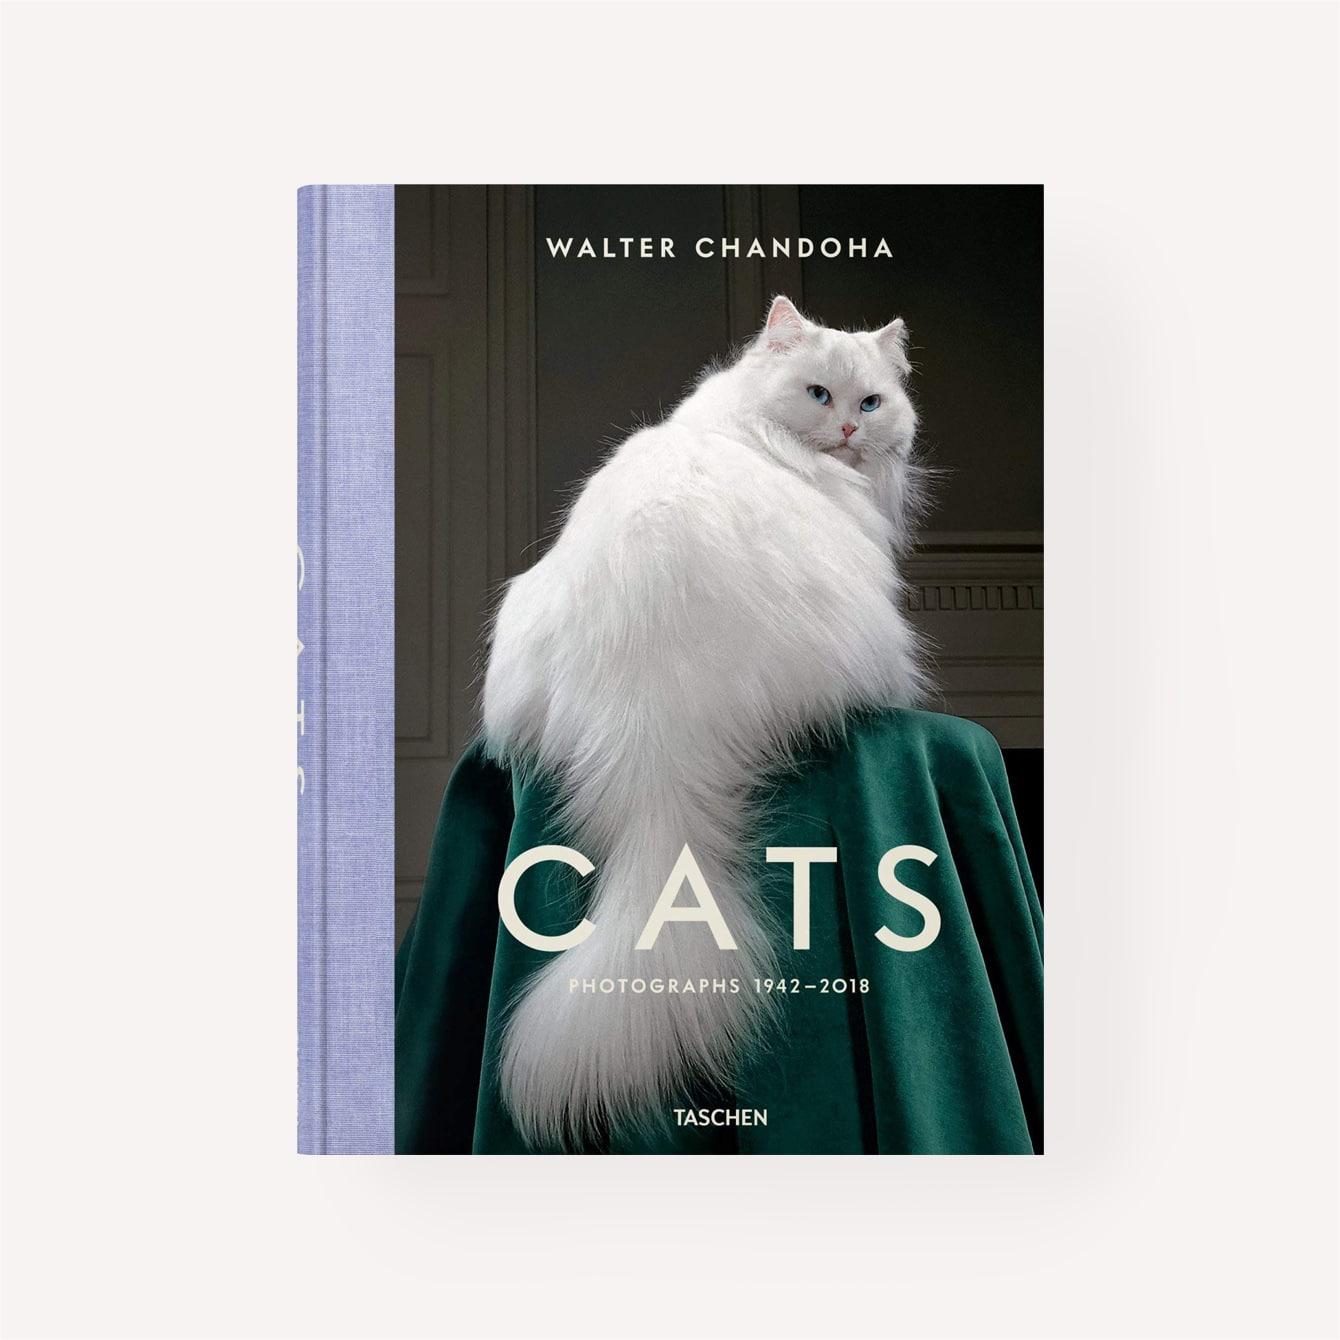 Cats Photographs 1942-2018